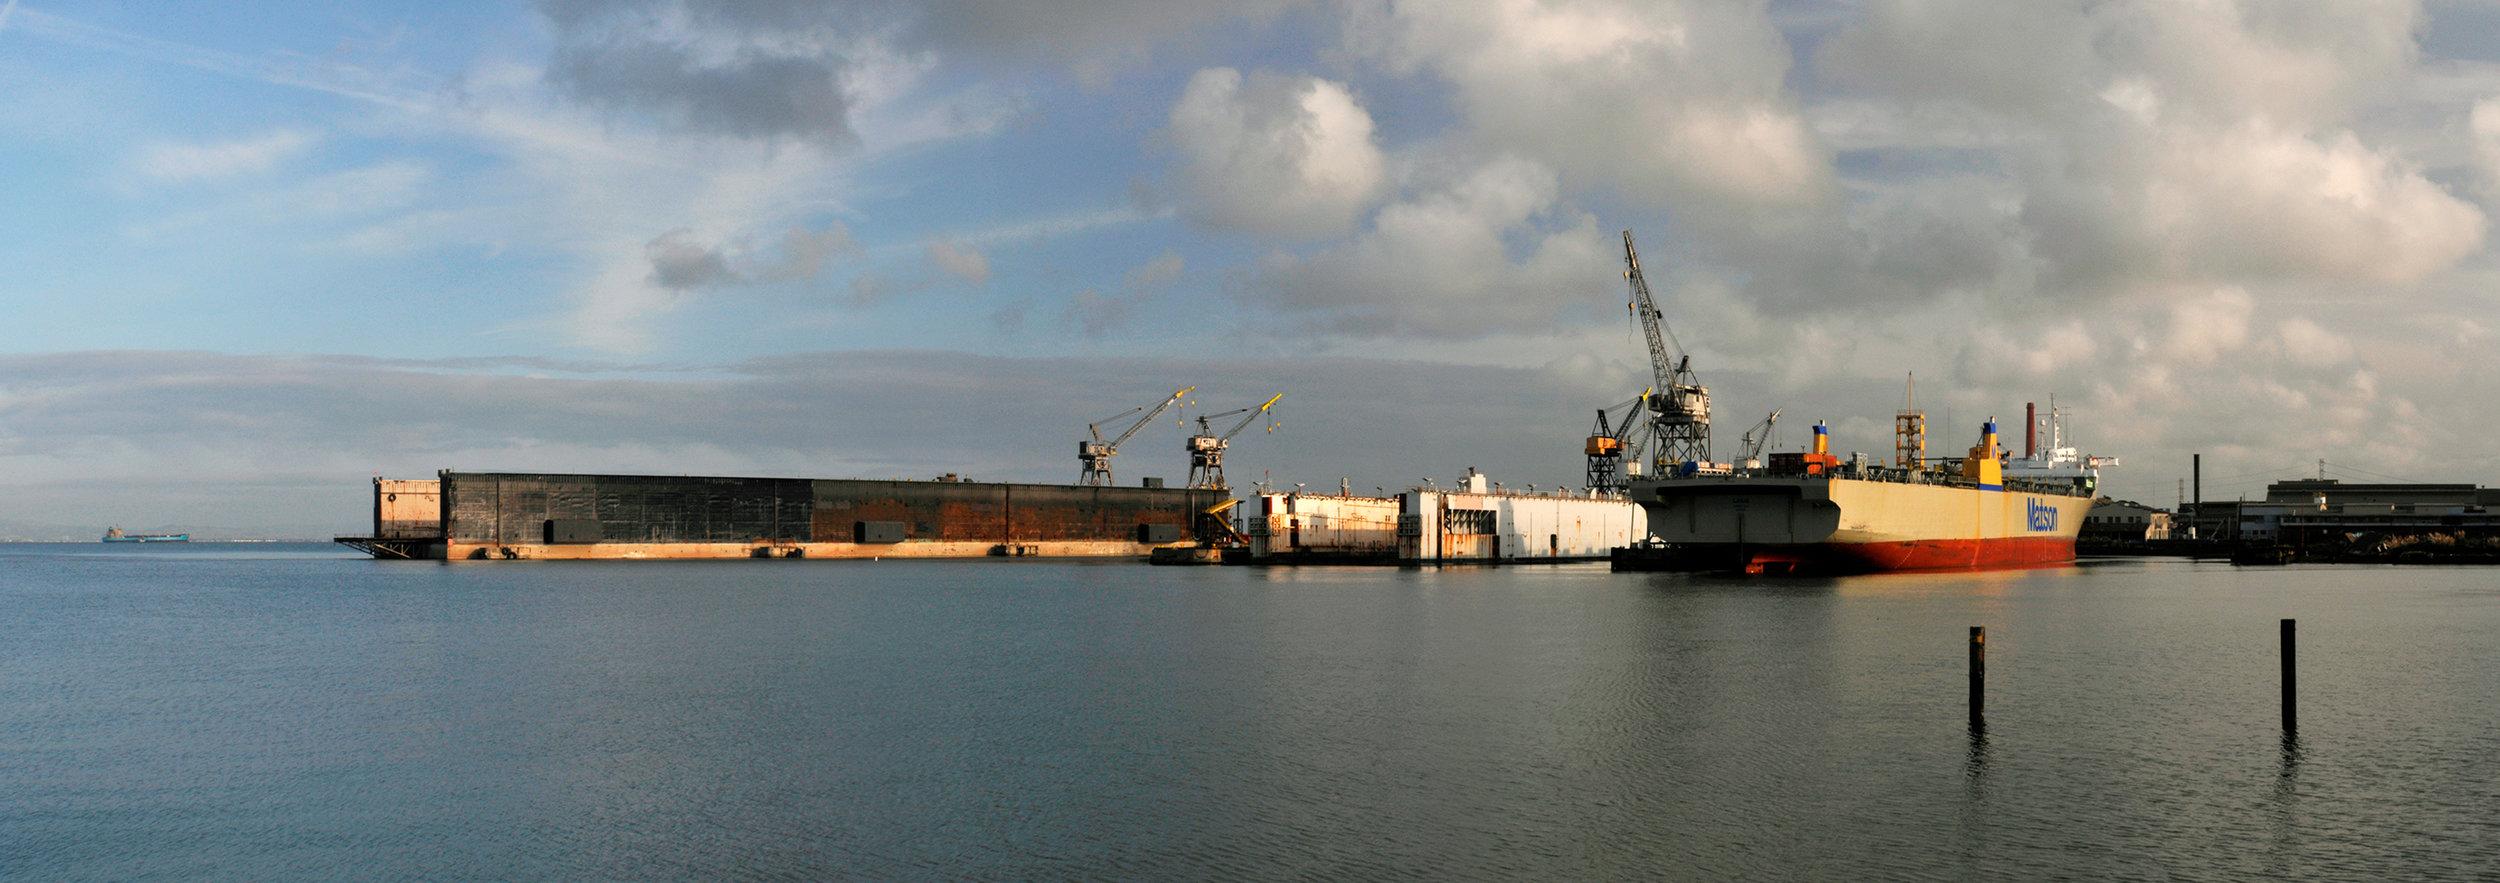 Bay Panorama #1